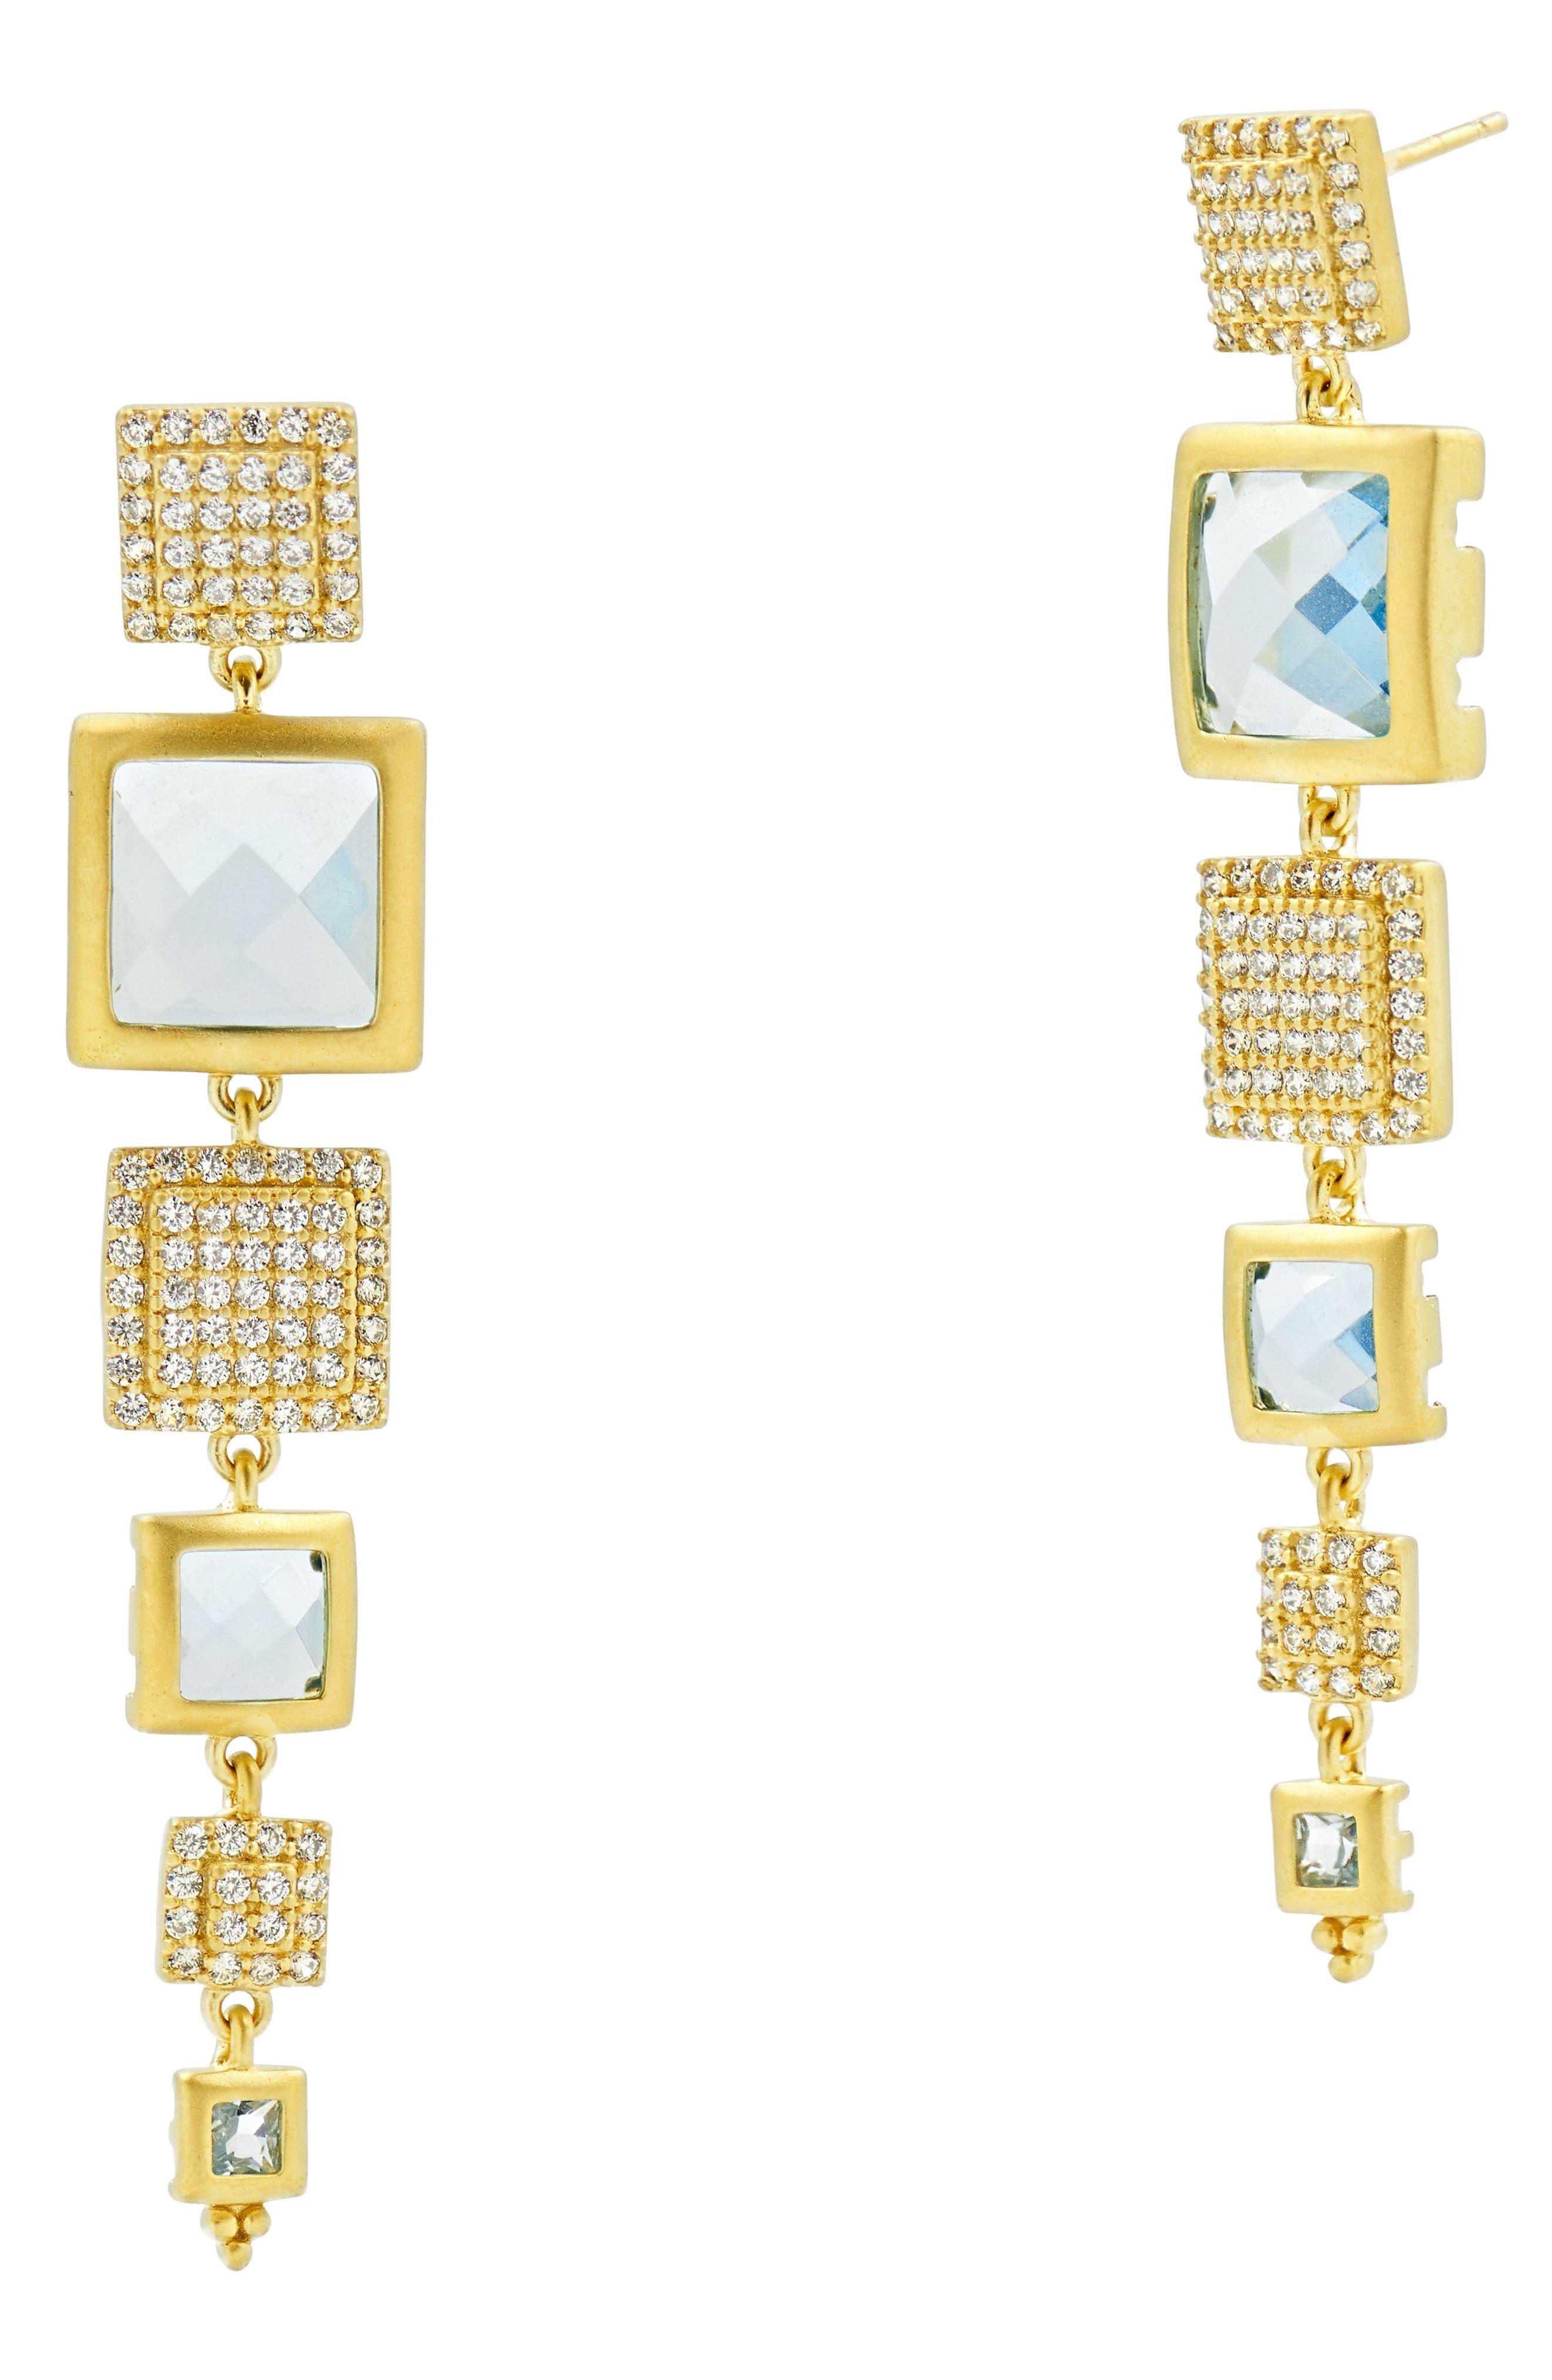 FREIDA ROTHMAN Frieda Rothman Ocean Azure Line Earrings in Gold/ Aqua